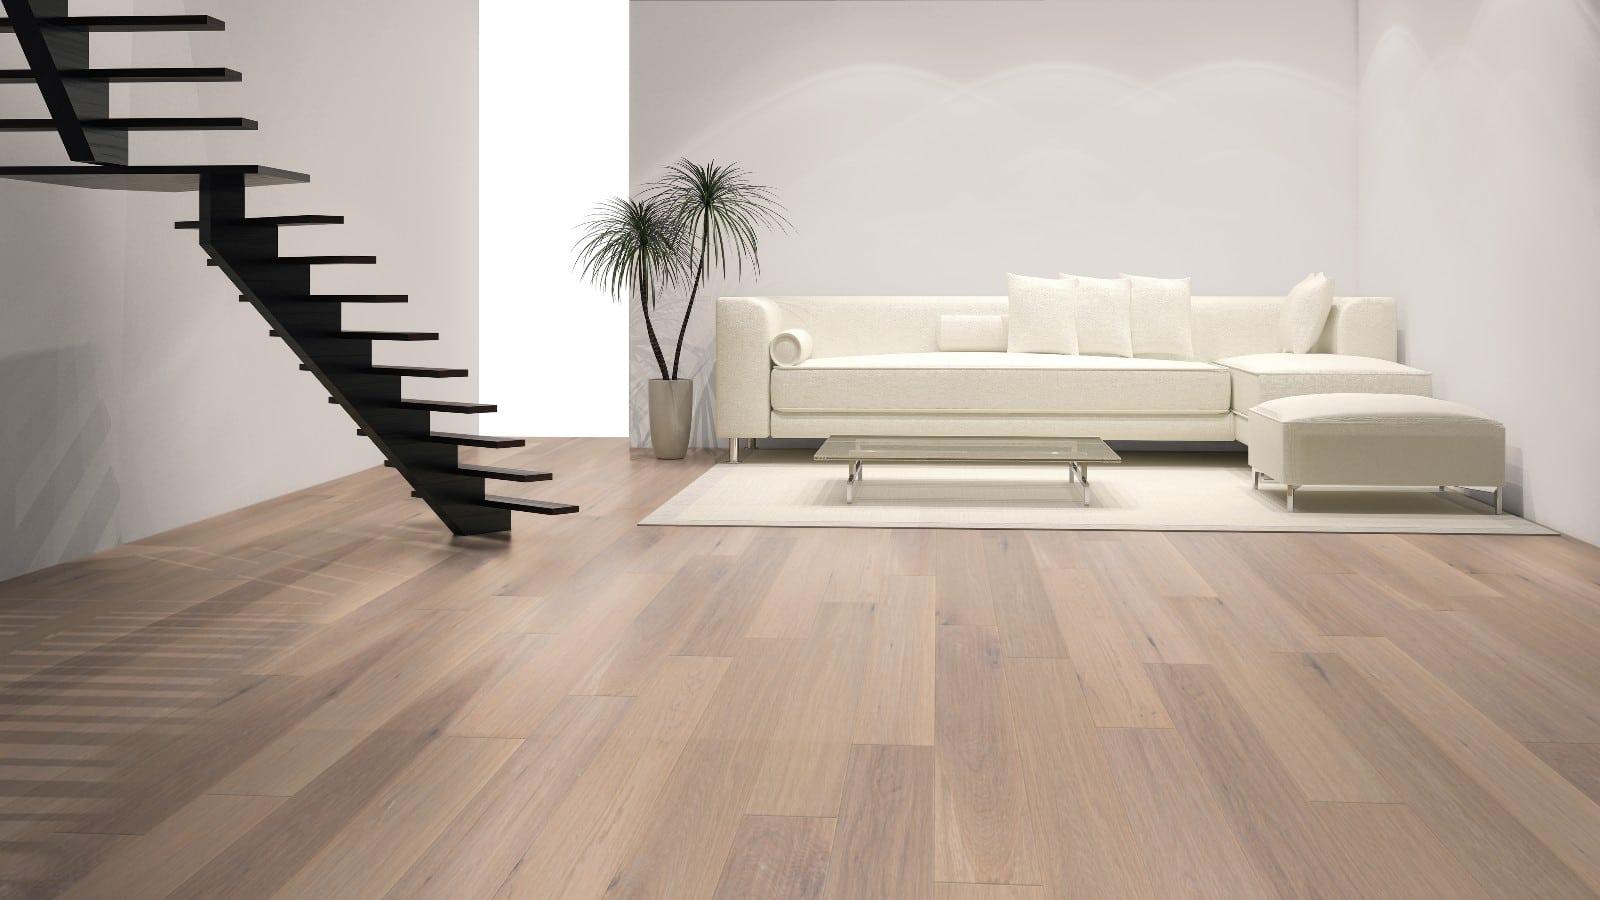 French hardwood oak flooring crestwood of lymington for Floor design website